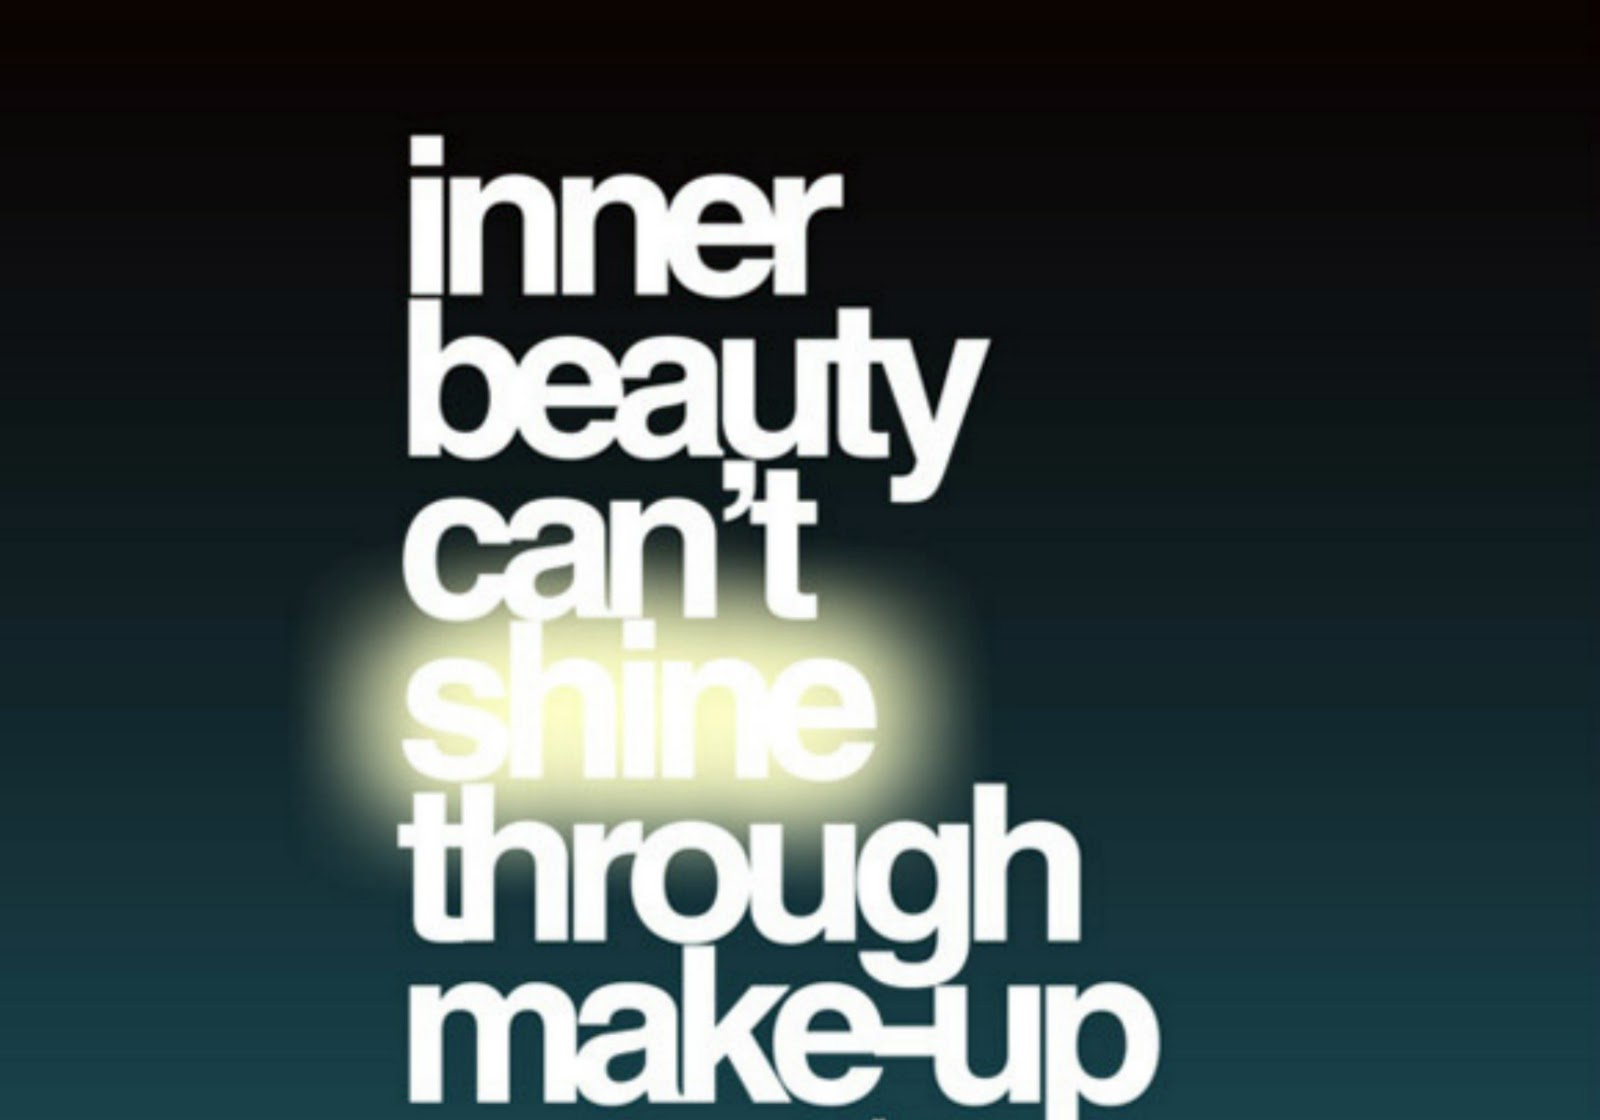 http://4.bp.blogspot.com/-uv2wOriaR8A/TnbbsNVcl5I/AAAAAAAACzI/B2UkJQeAMFs/s1600/15-inner-beauty-typography.jpg